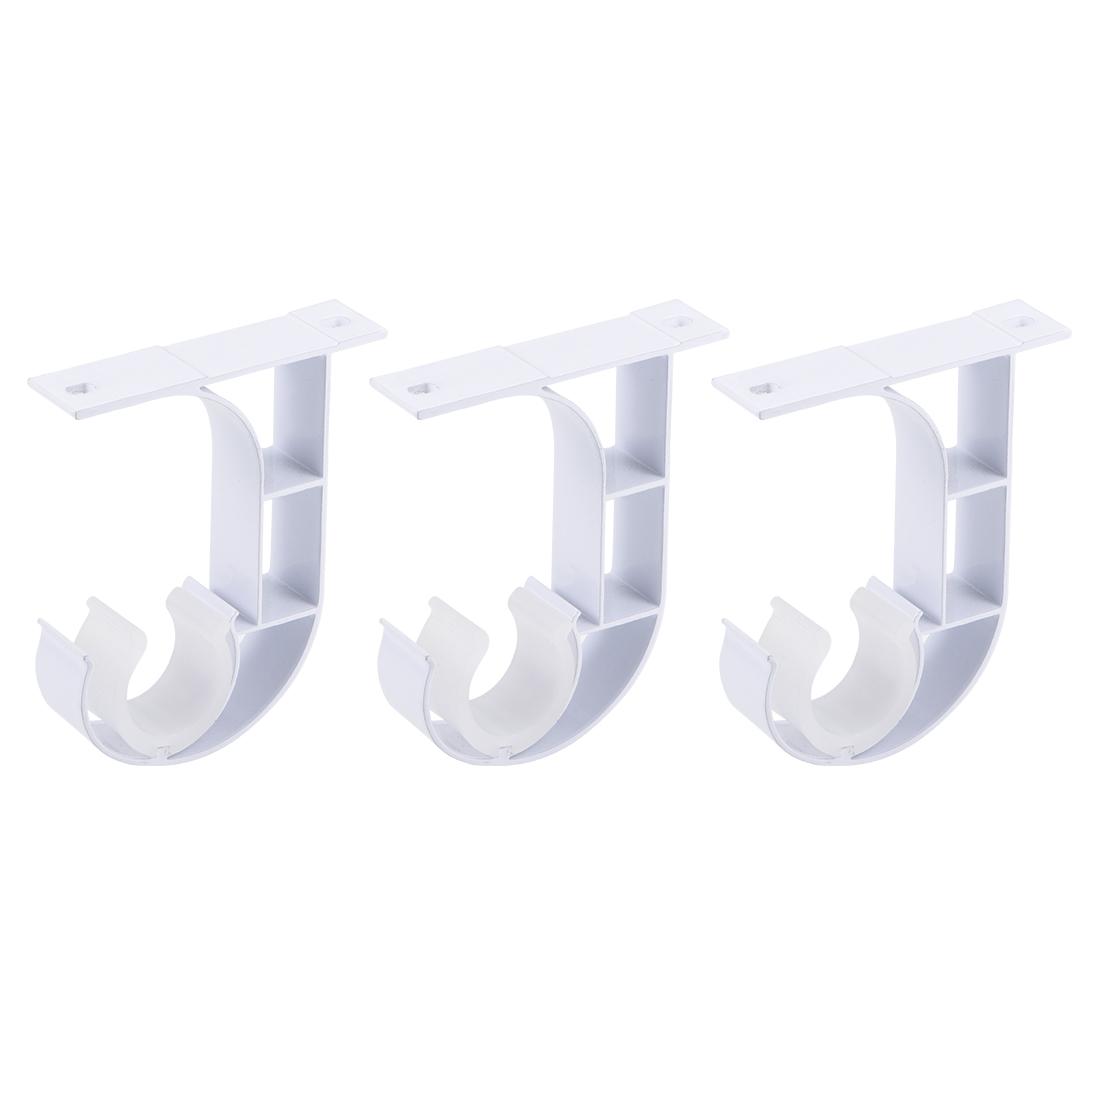 Curtain Rod Bracket Single Holder for 24mm Drapery Rod 90 x 75 x 19mm White 3Pcs